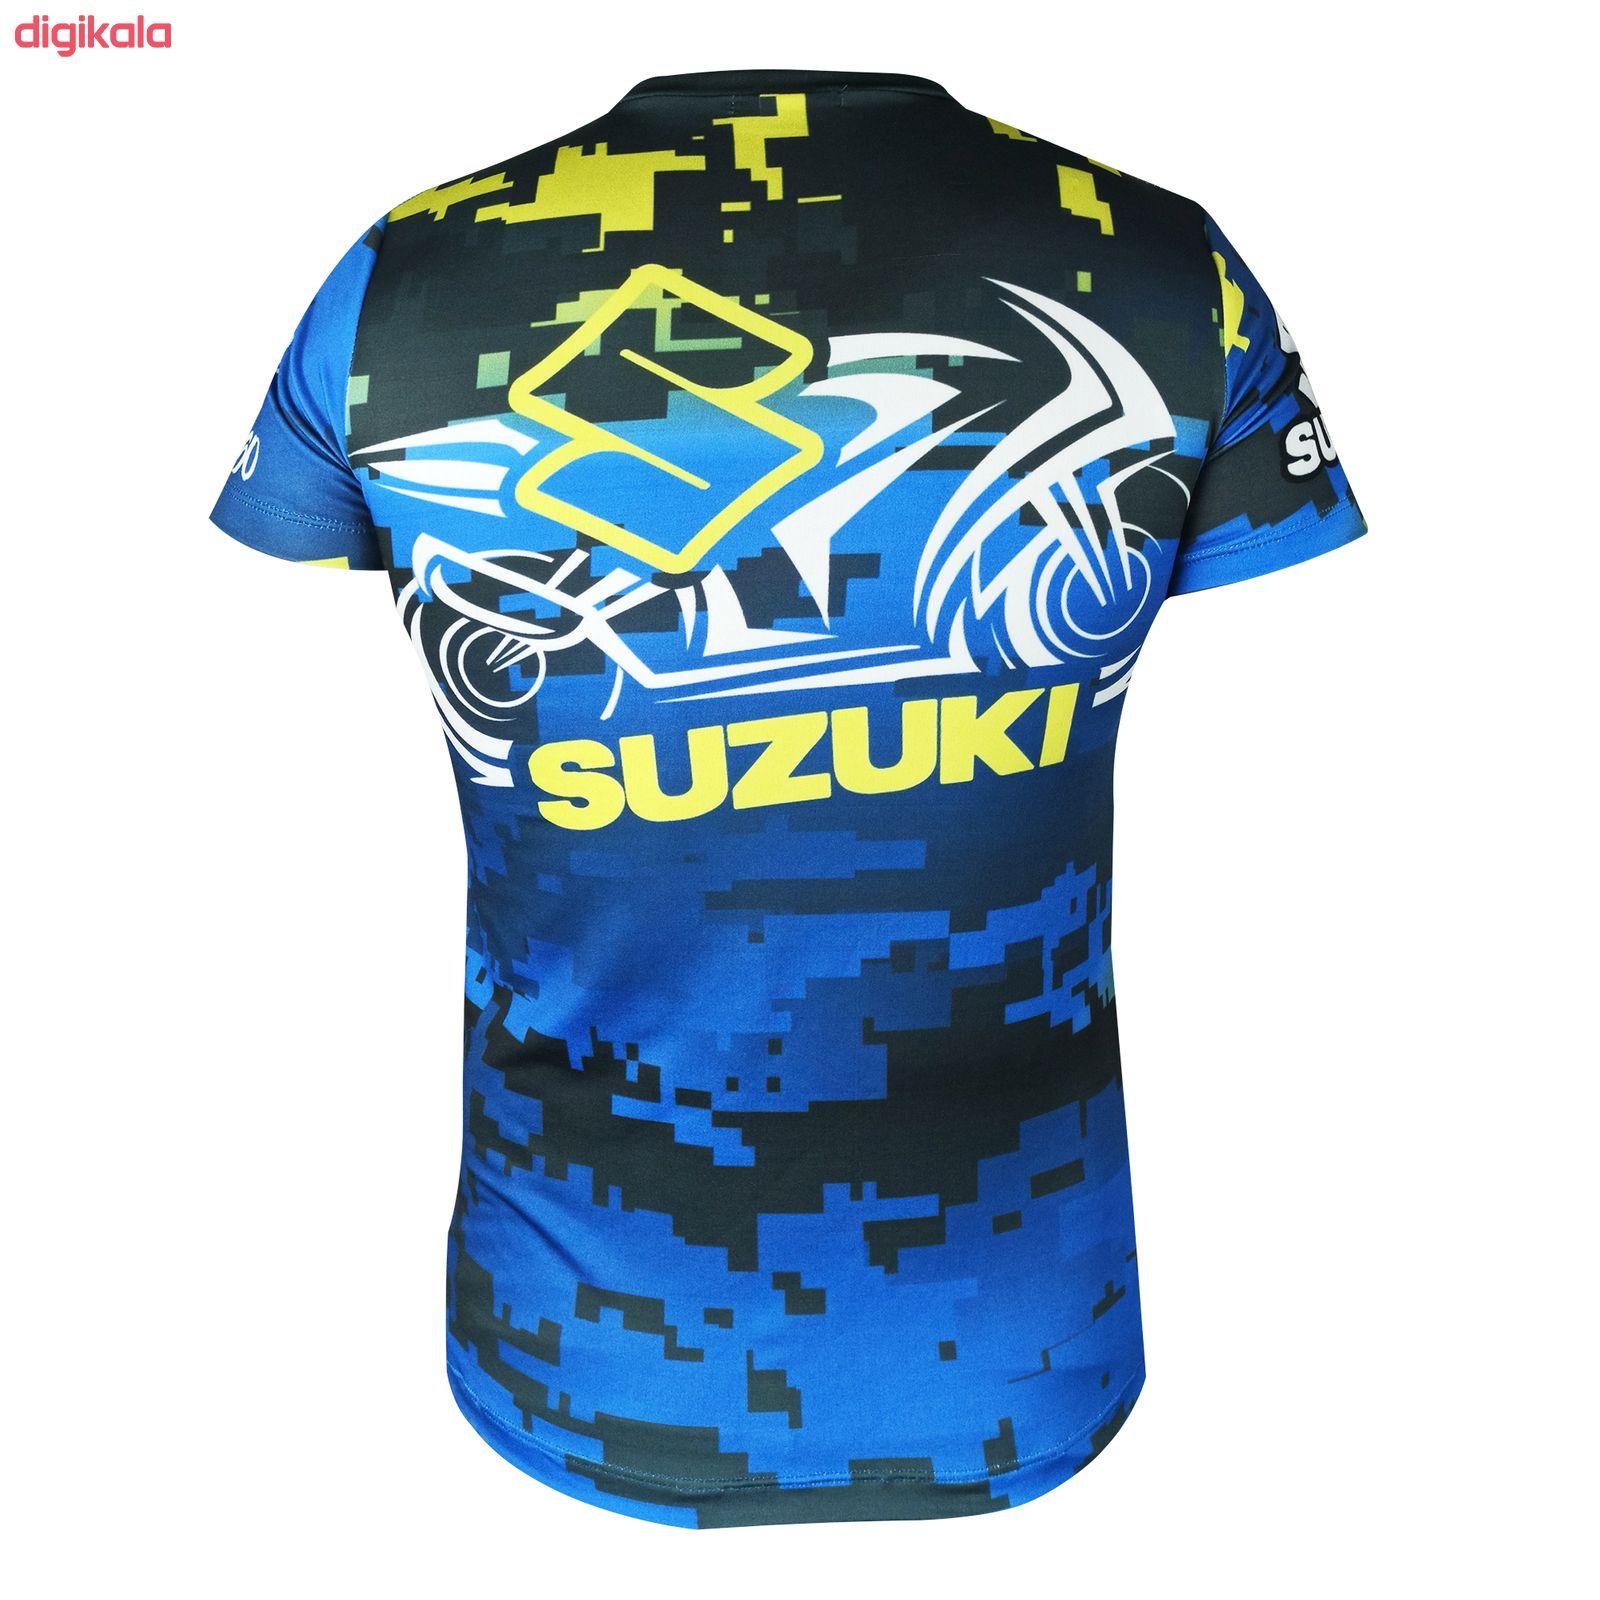 تی شرت موتور سواری مدل SUZUKI main 1 1